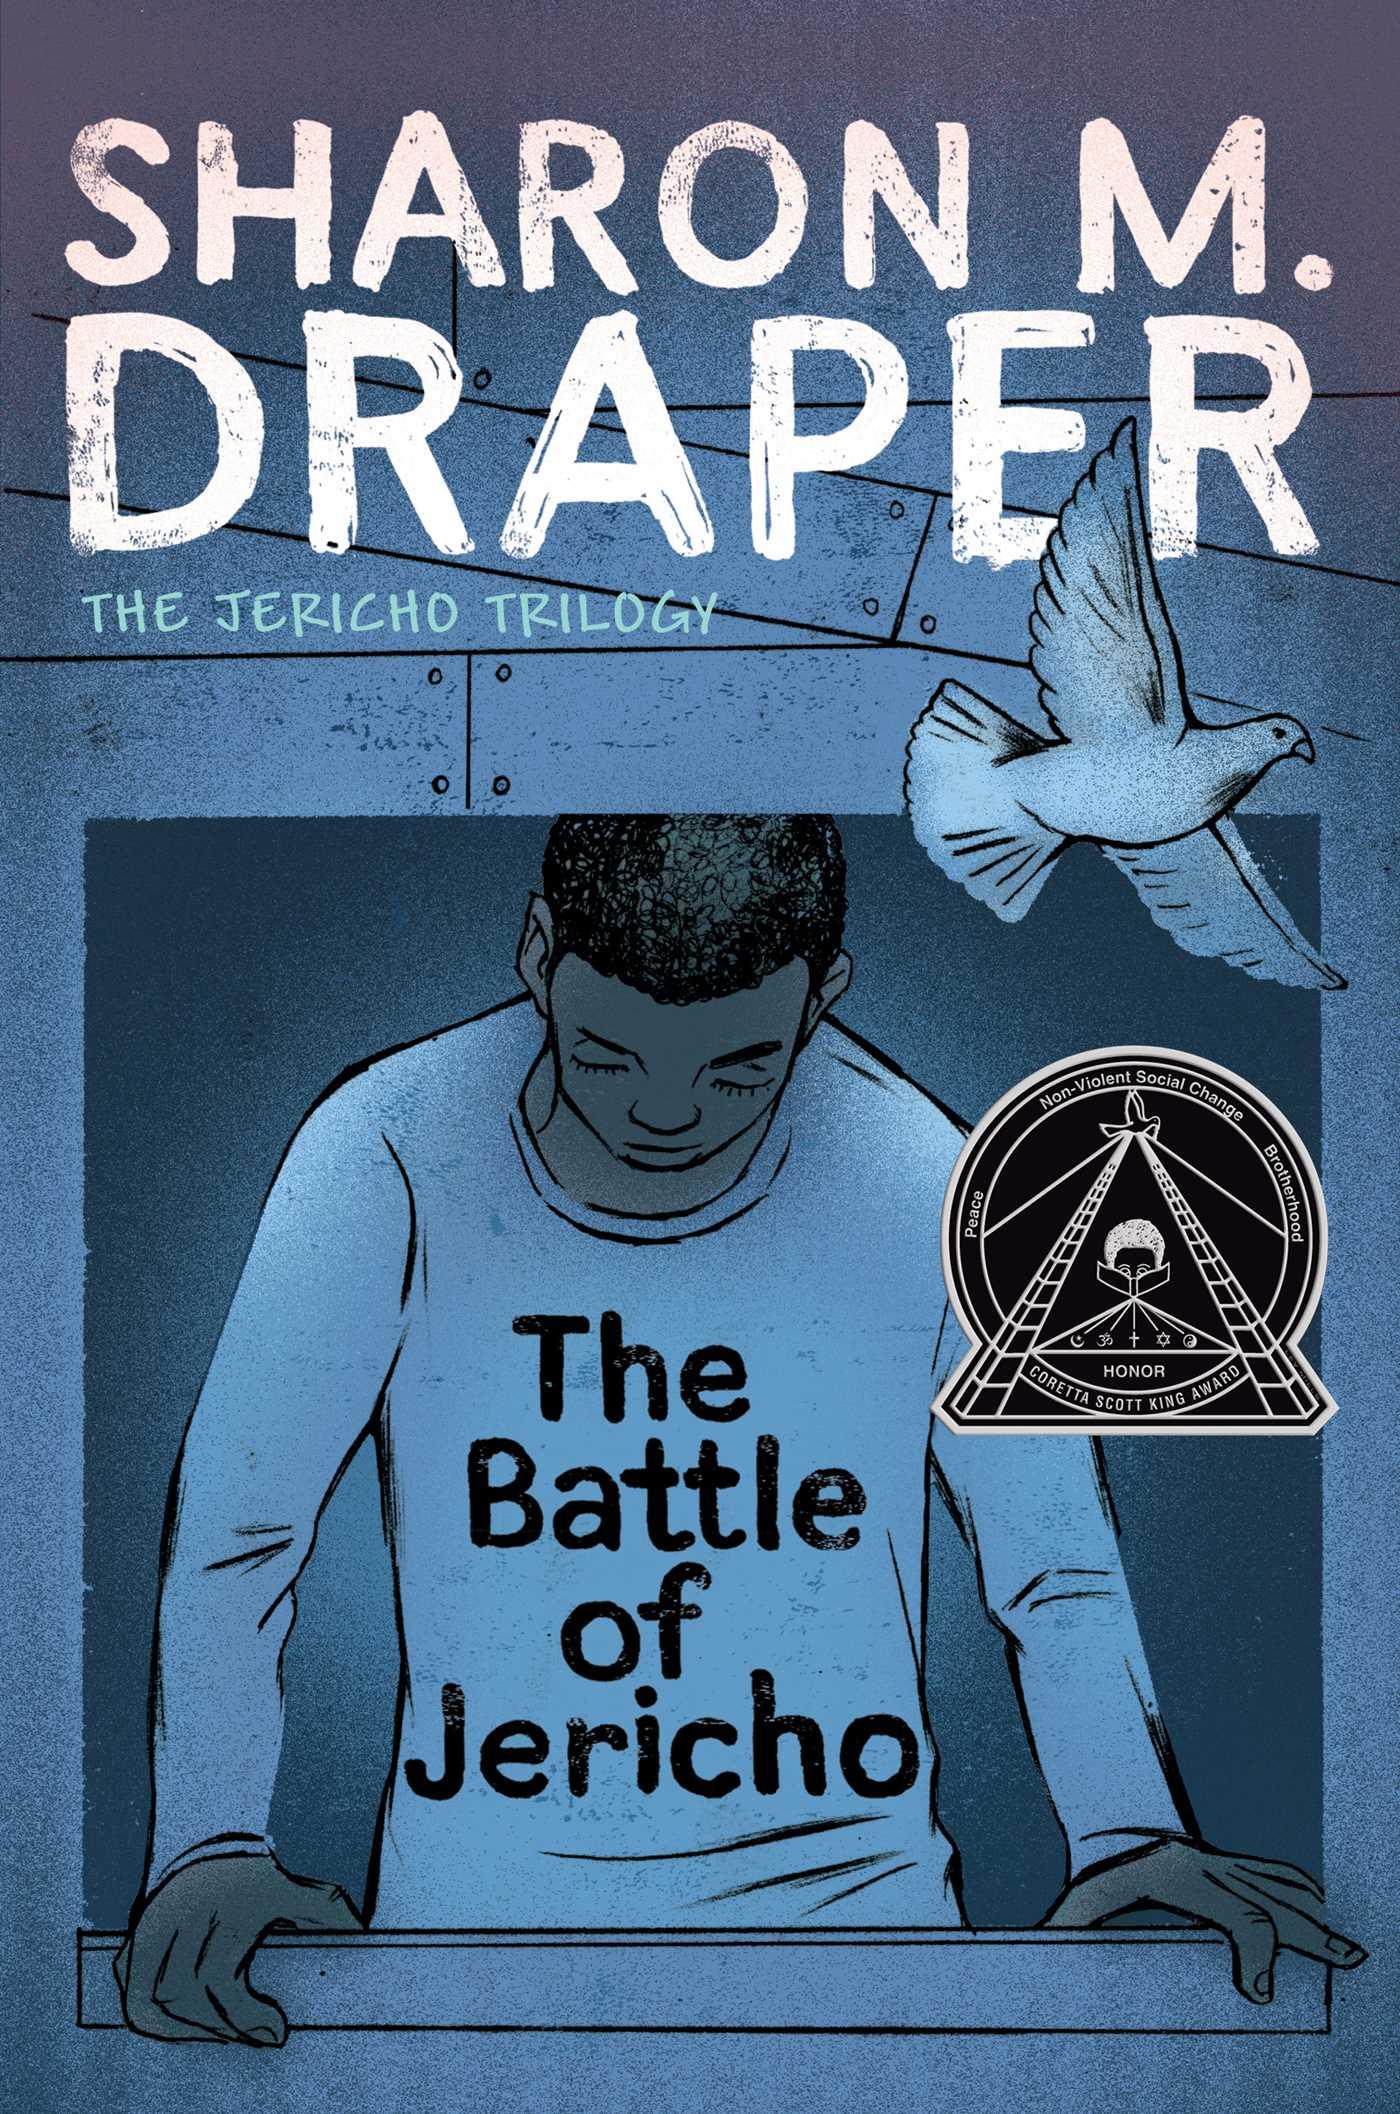 The battle of jericho 9781481490290 hr